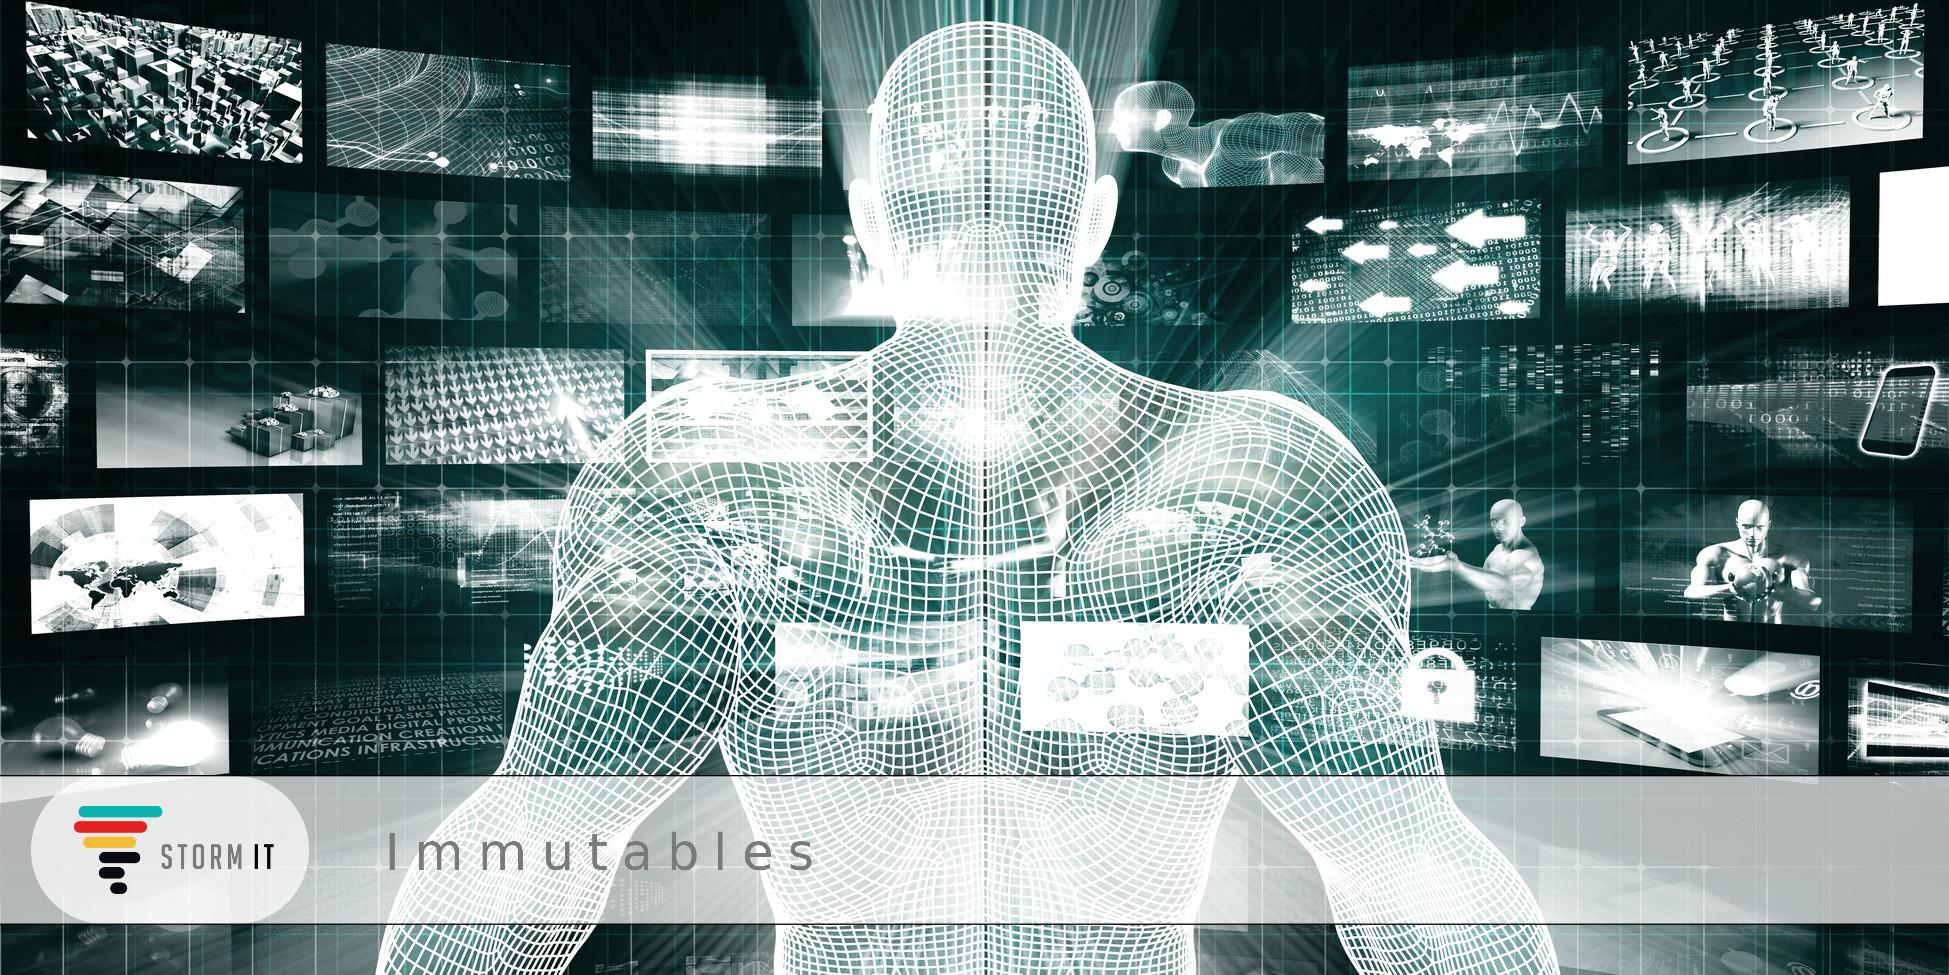 Immutables